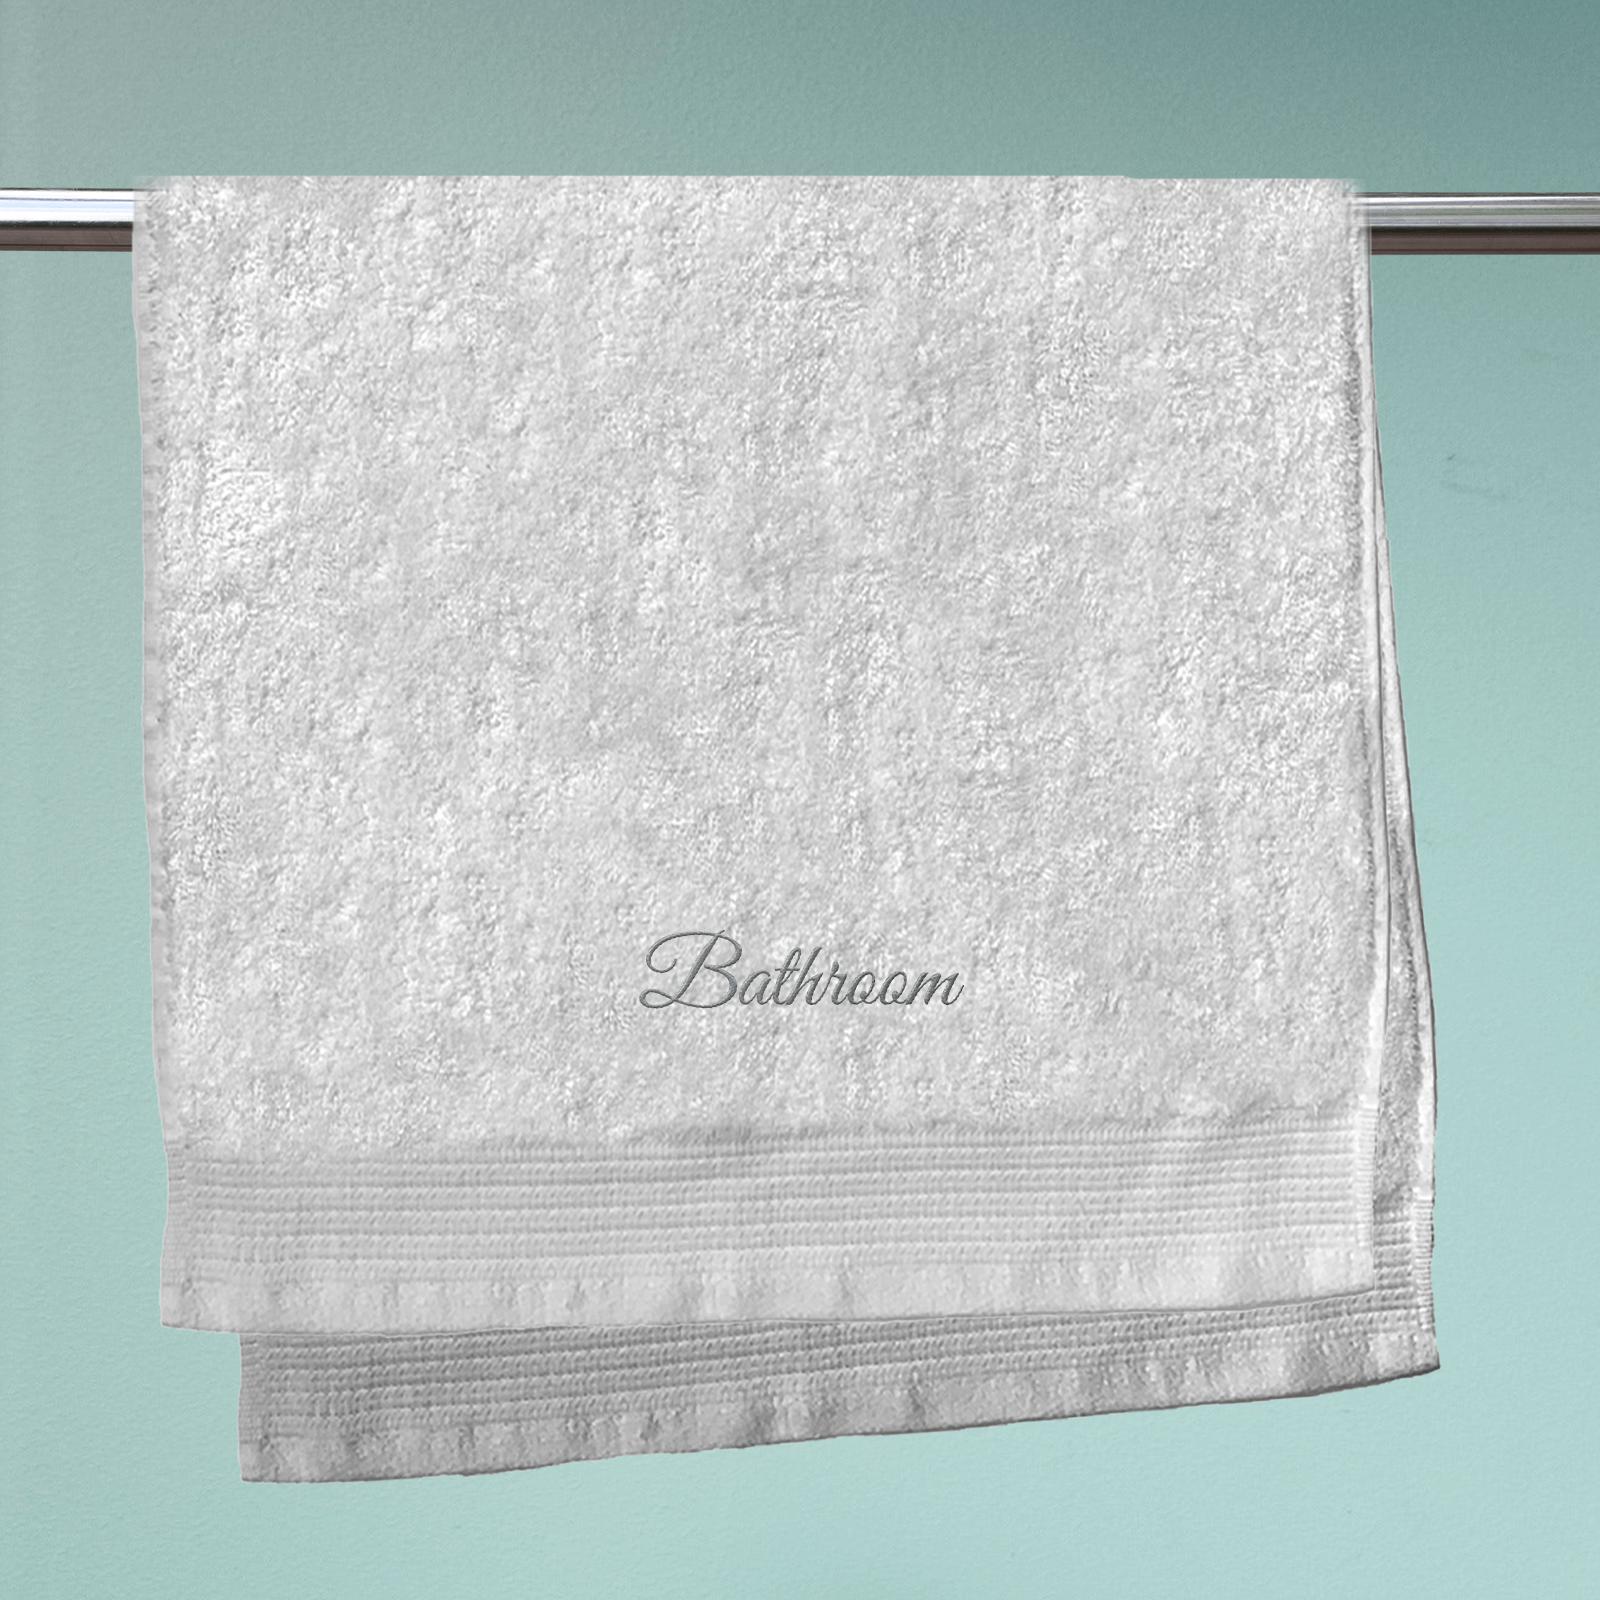 Bathroom Embroidered Hand Towel